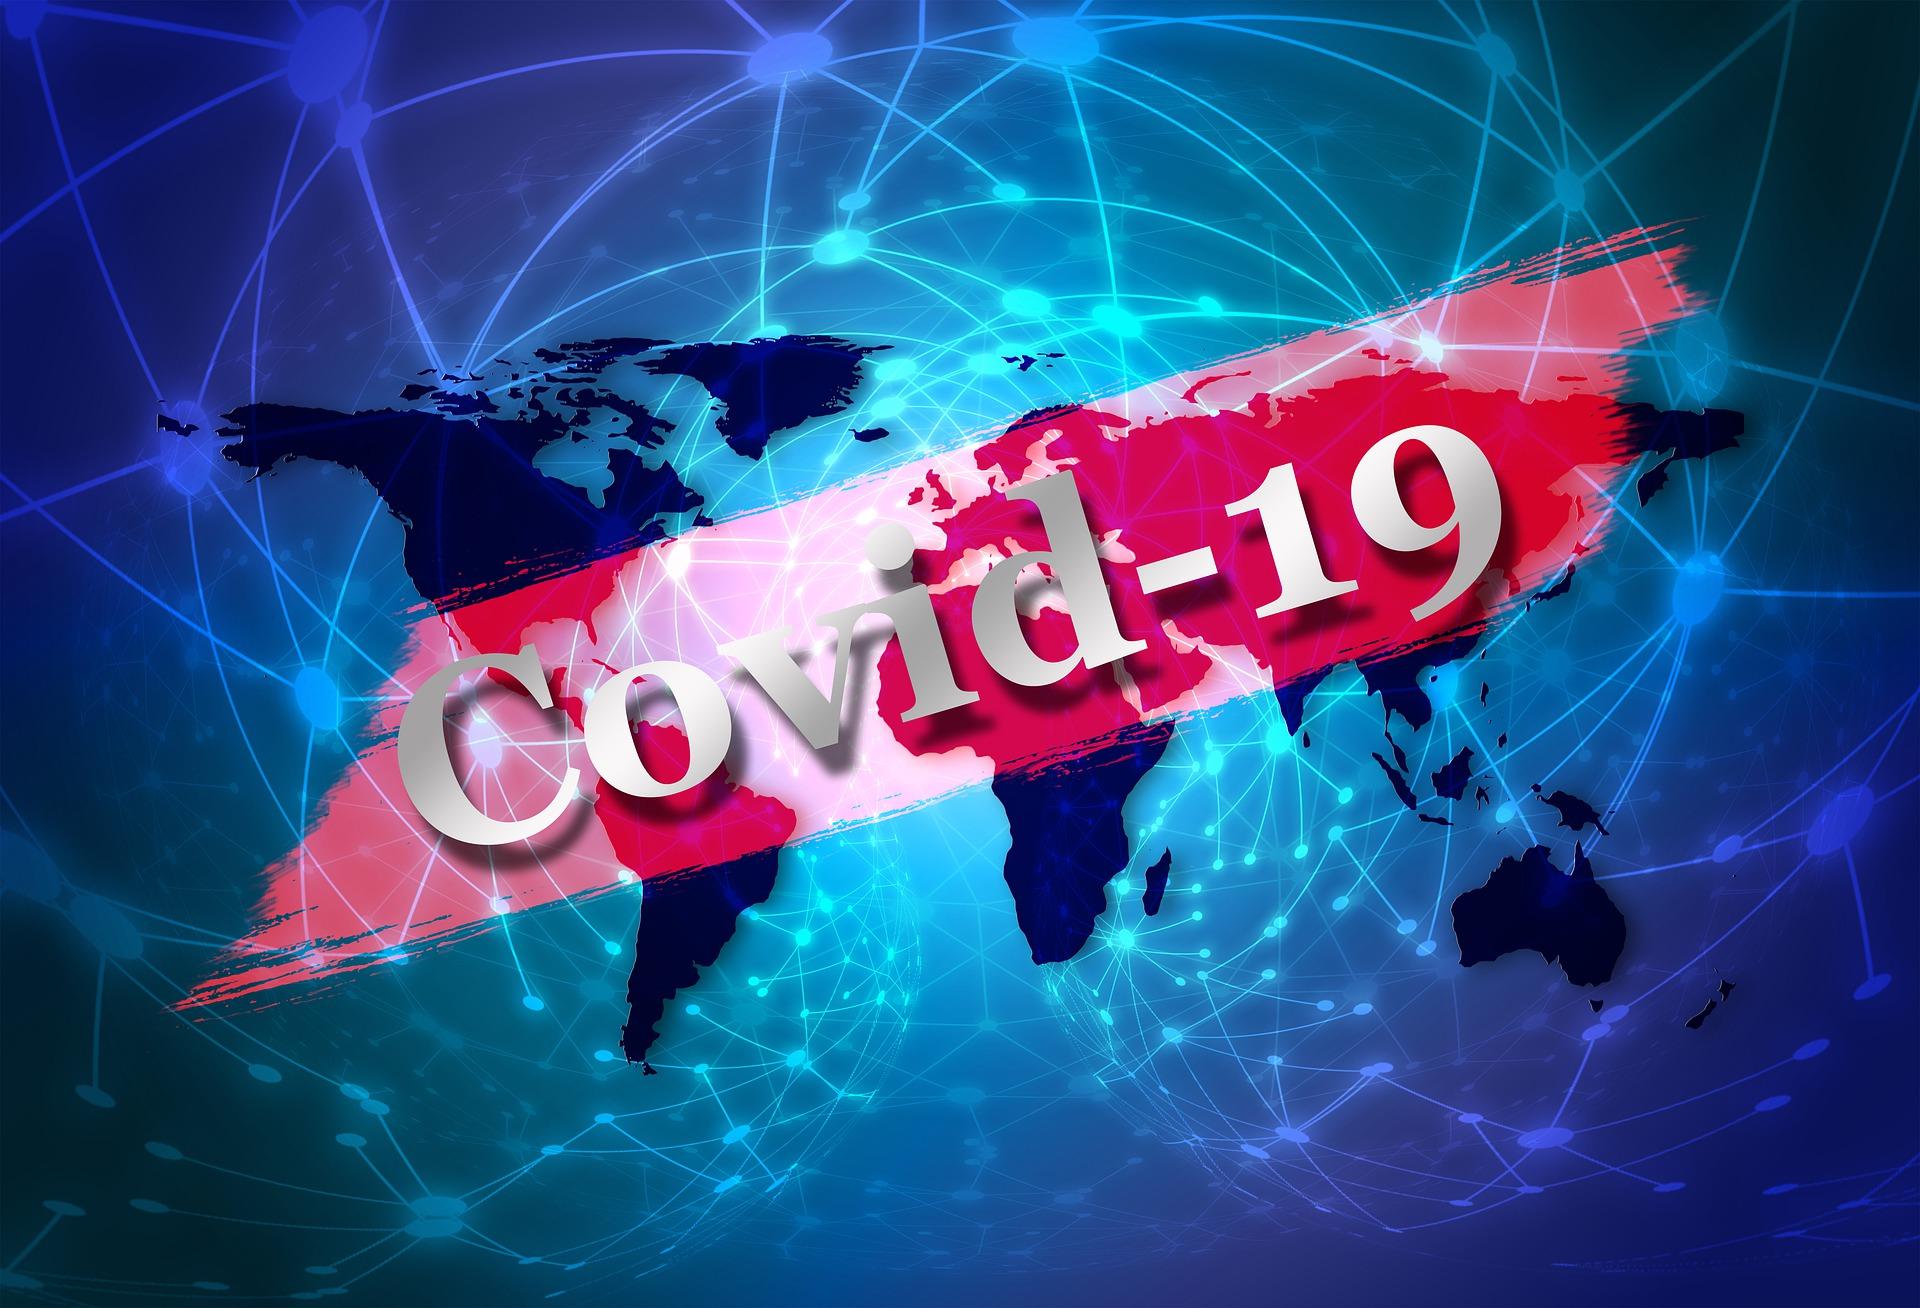 VeChain-based App E-HCert Will Help Combat Coronavirus In Cyprus